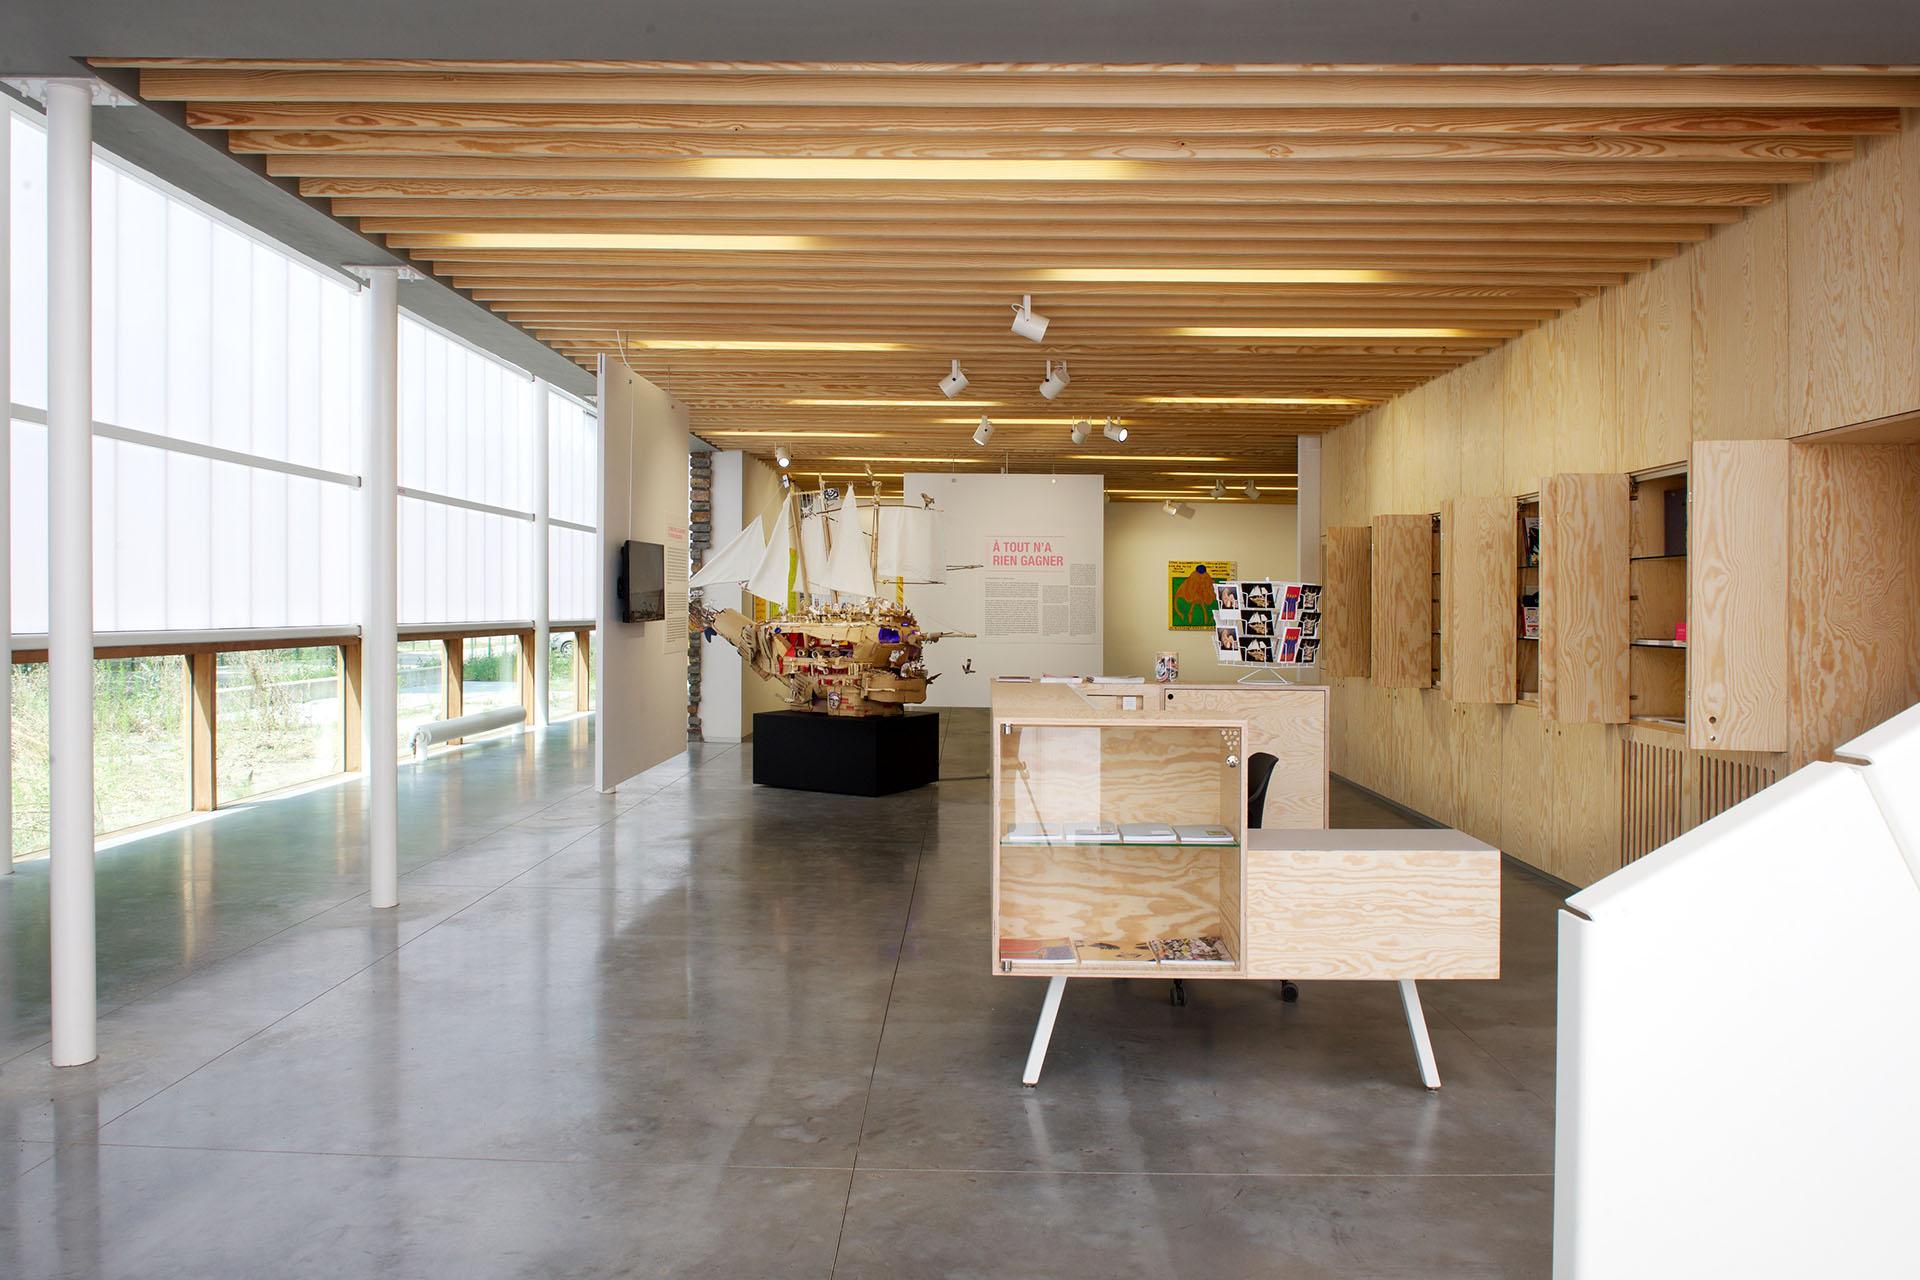 Trinkhall museum - Liège